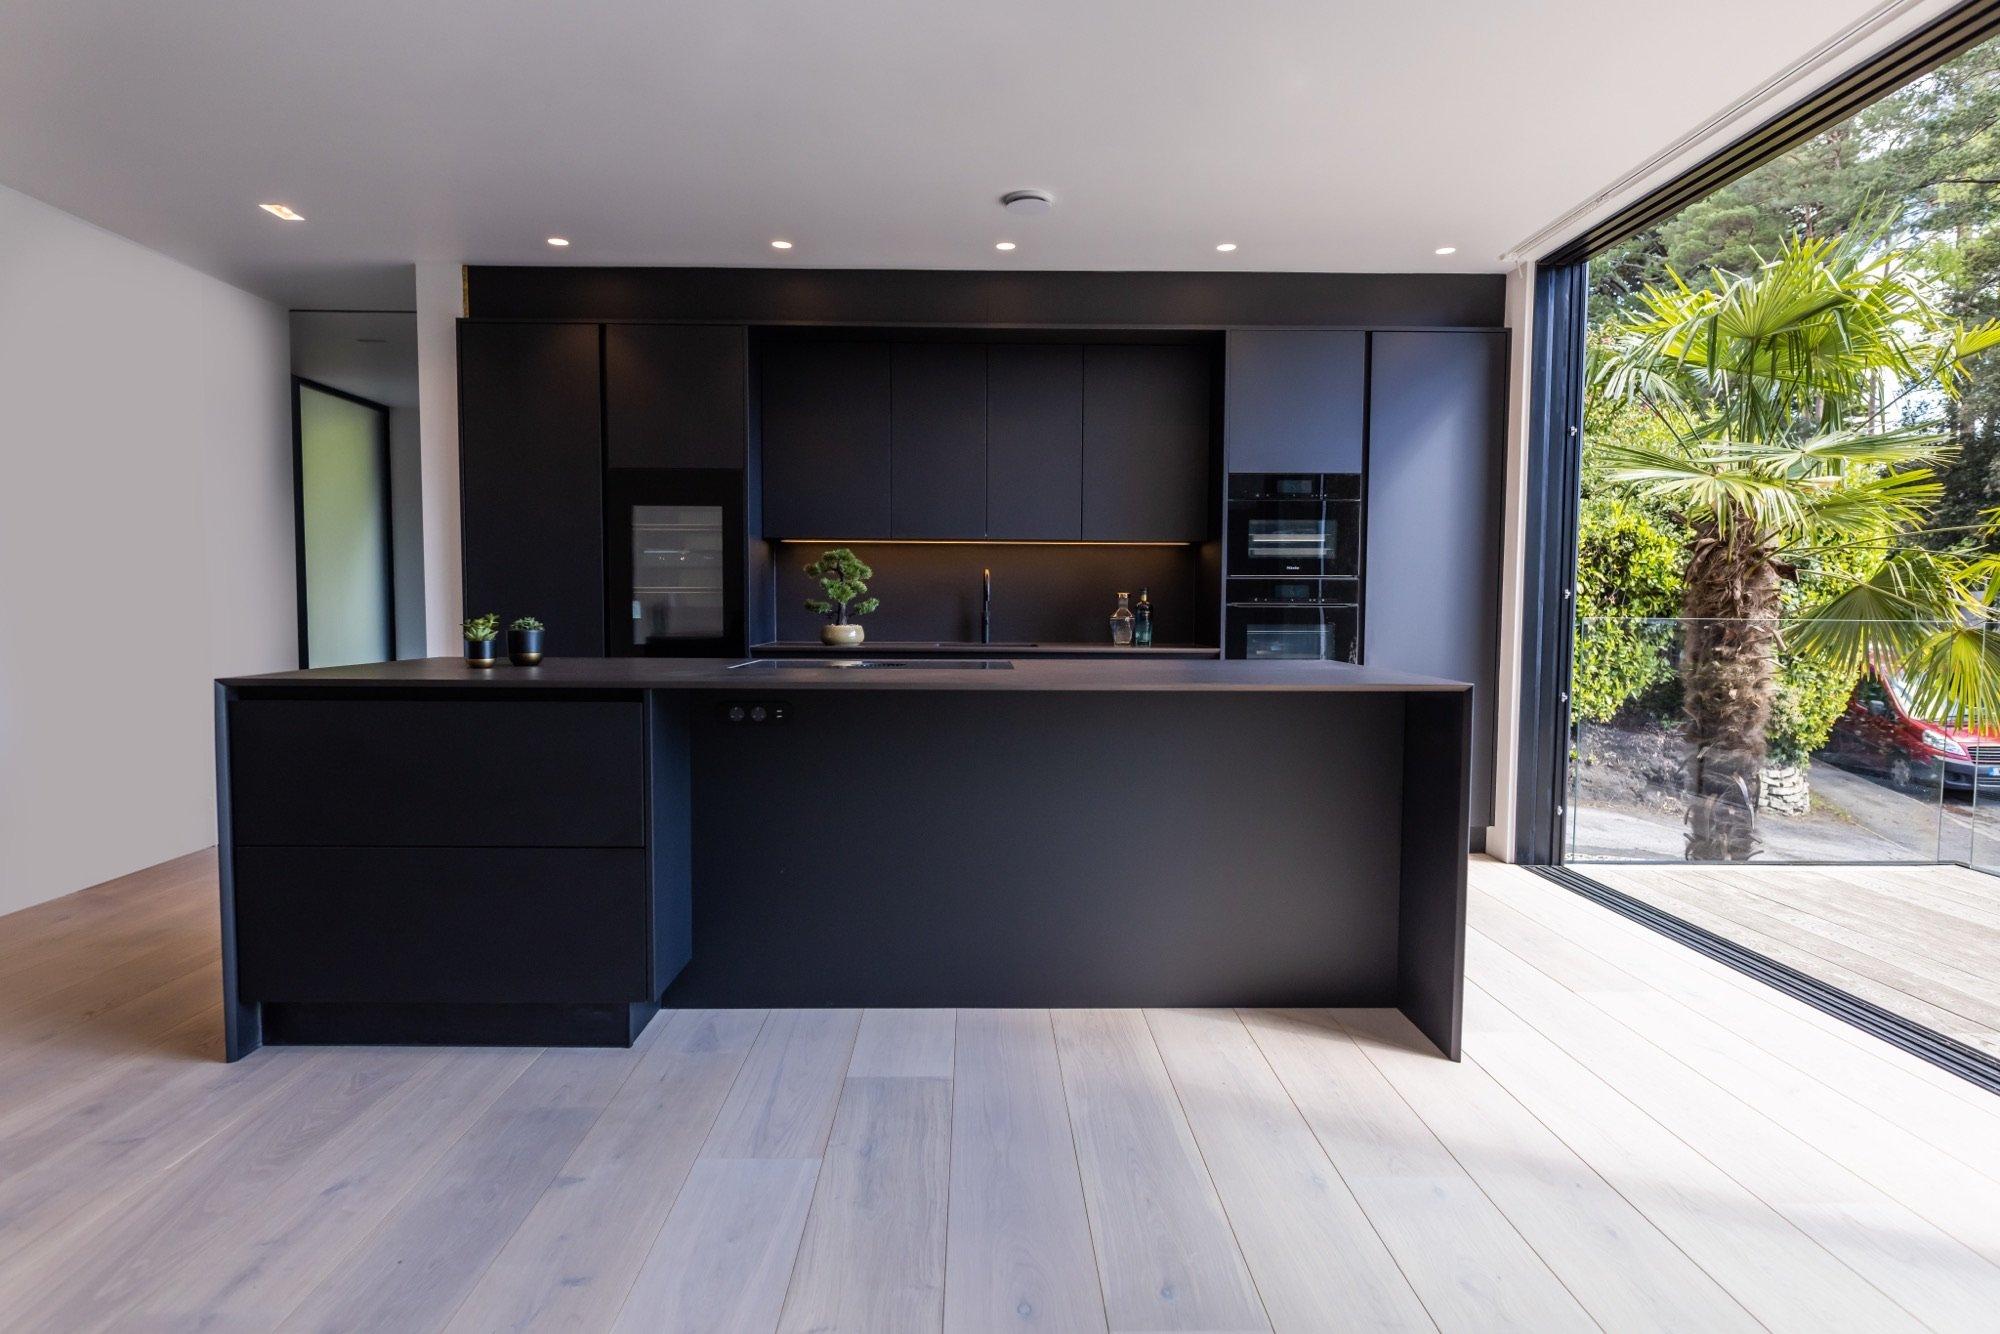 Dekton Sirius Kitchen Worktop with Black Grey Cabinets